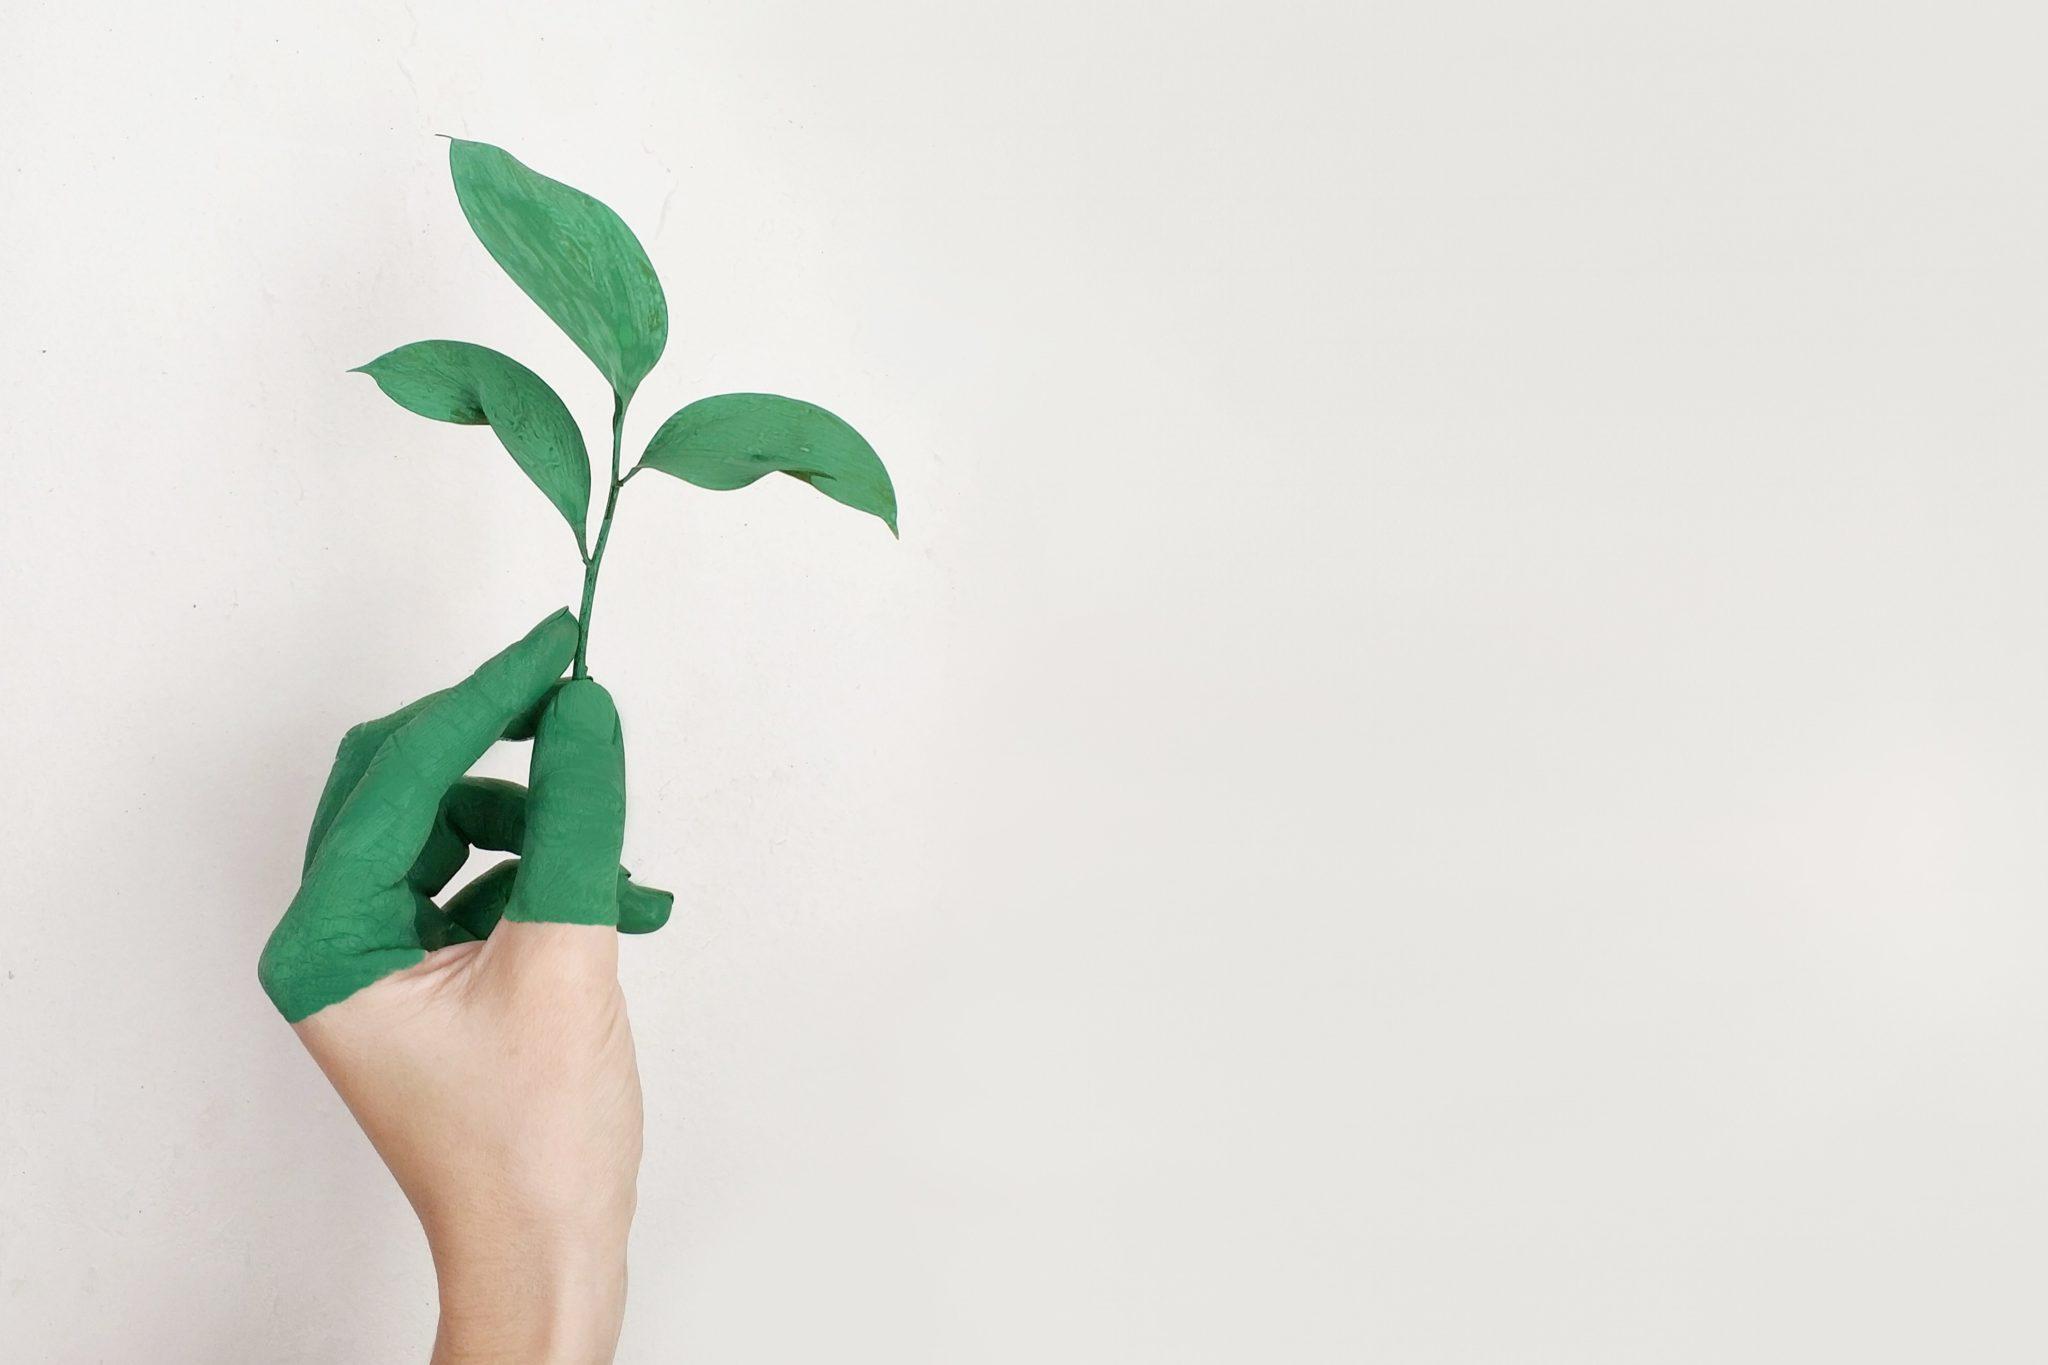 Sustainability & CSR